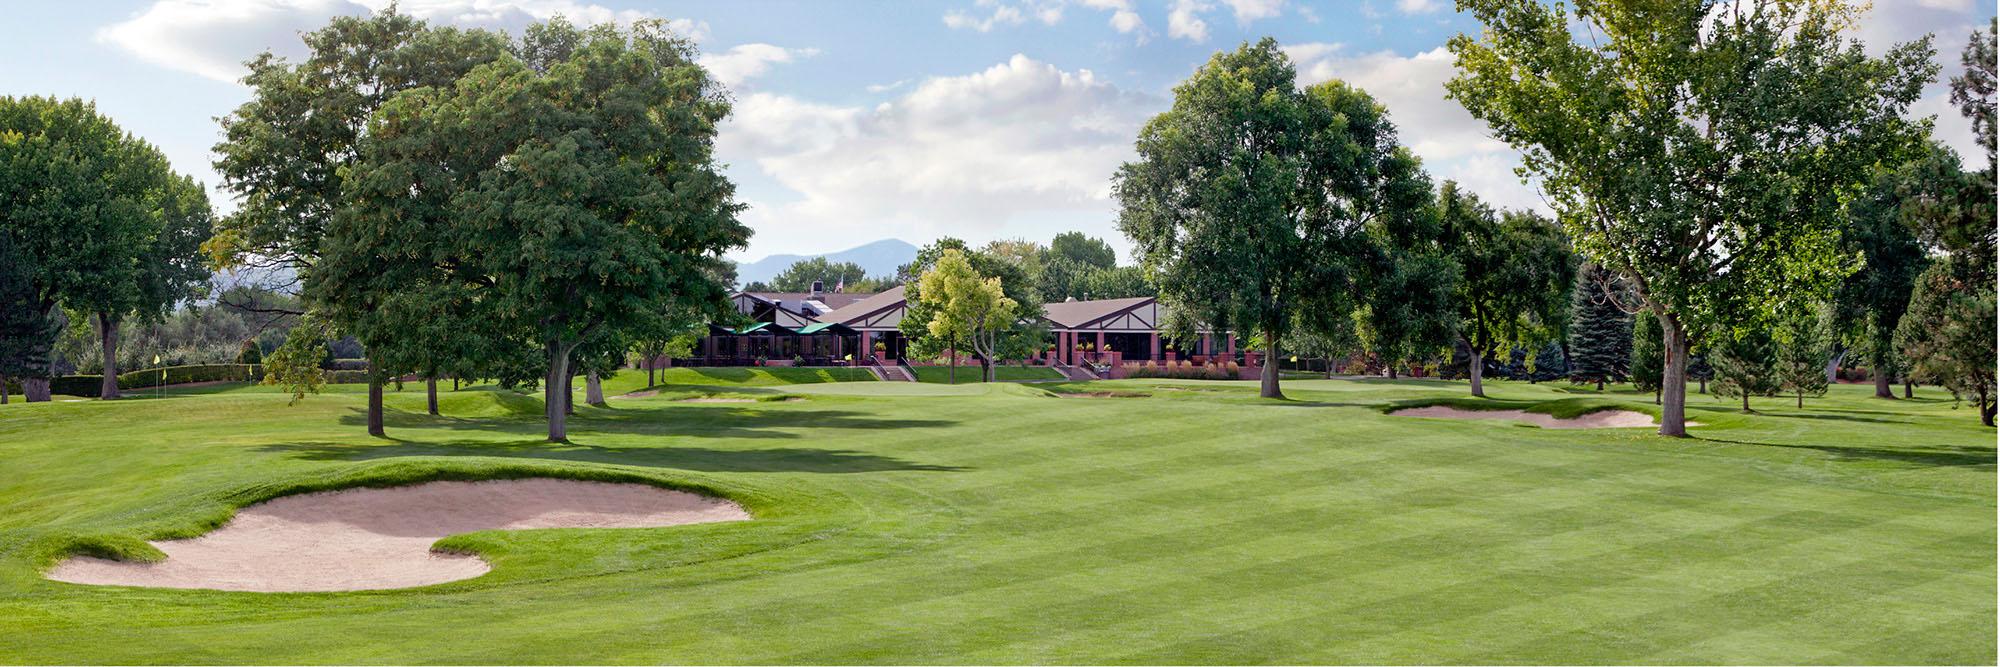 Golf Course Image - Columbine Country Club No. 18